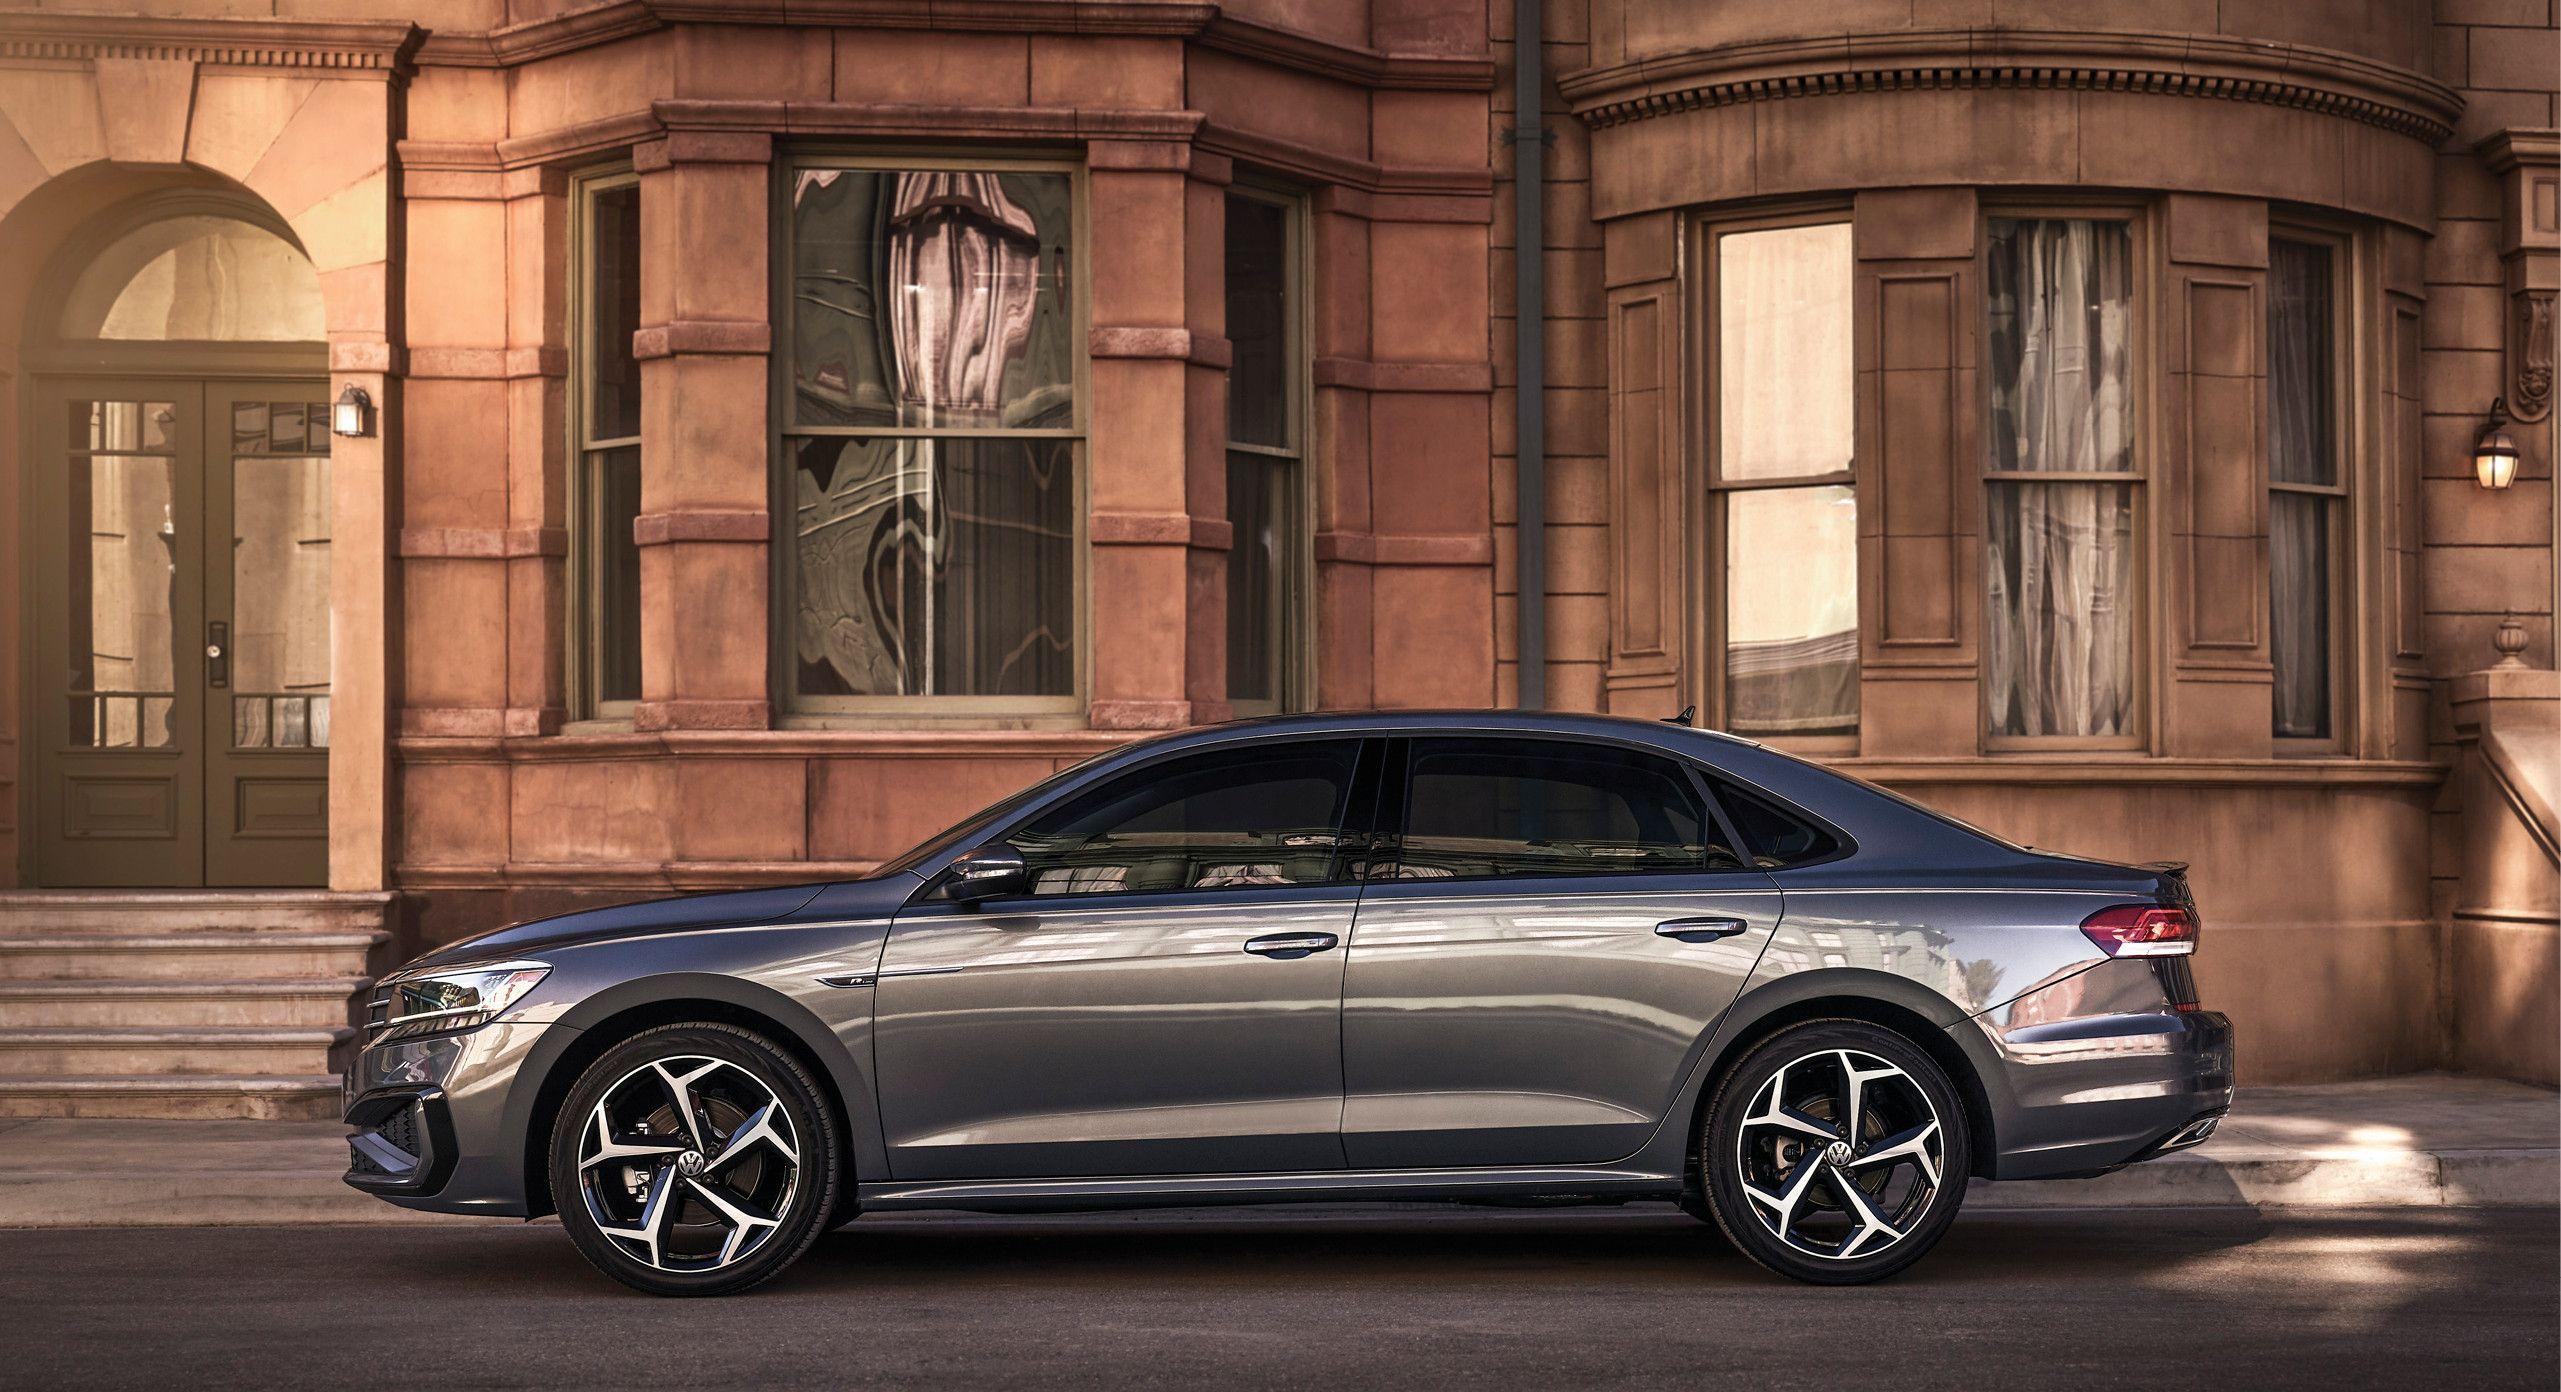 2020 Volkswagen Passat Trim Levels Concept Di 2020